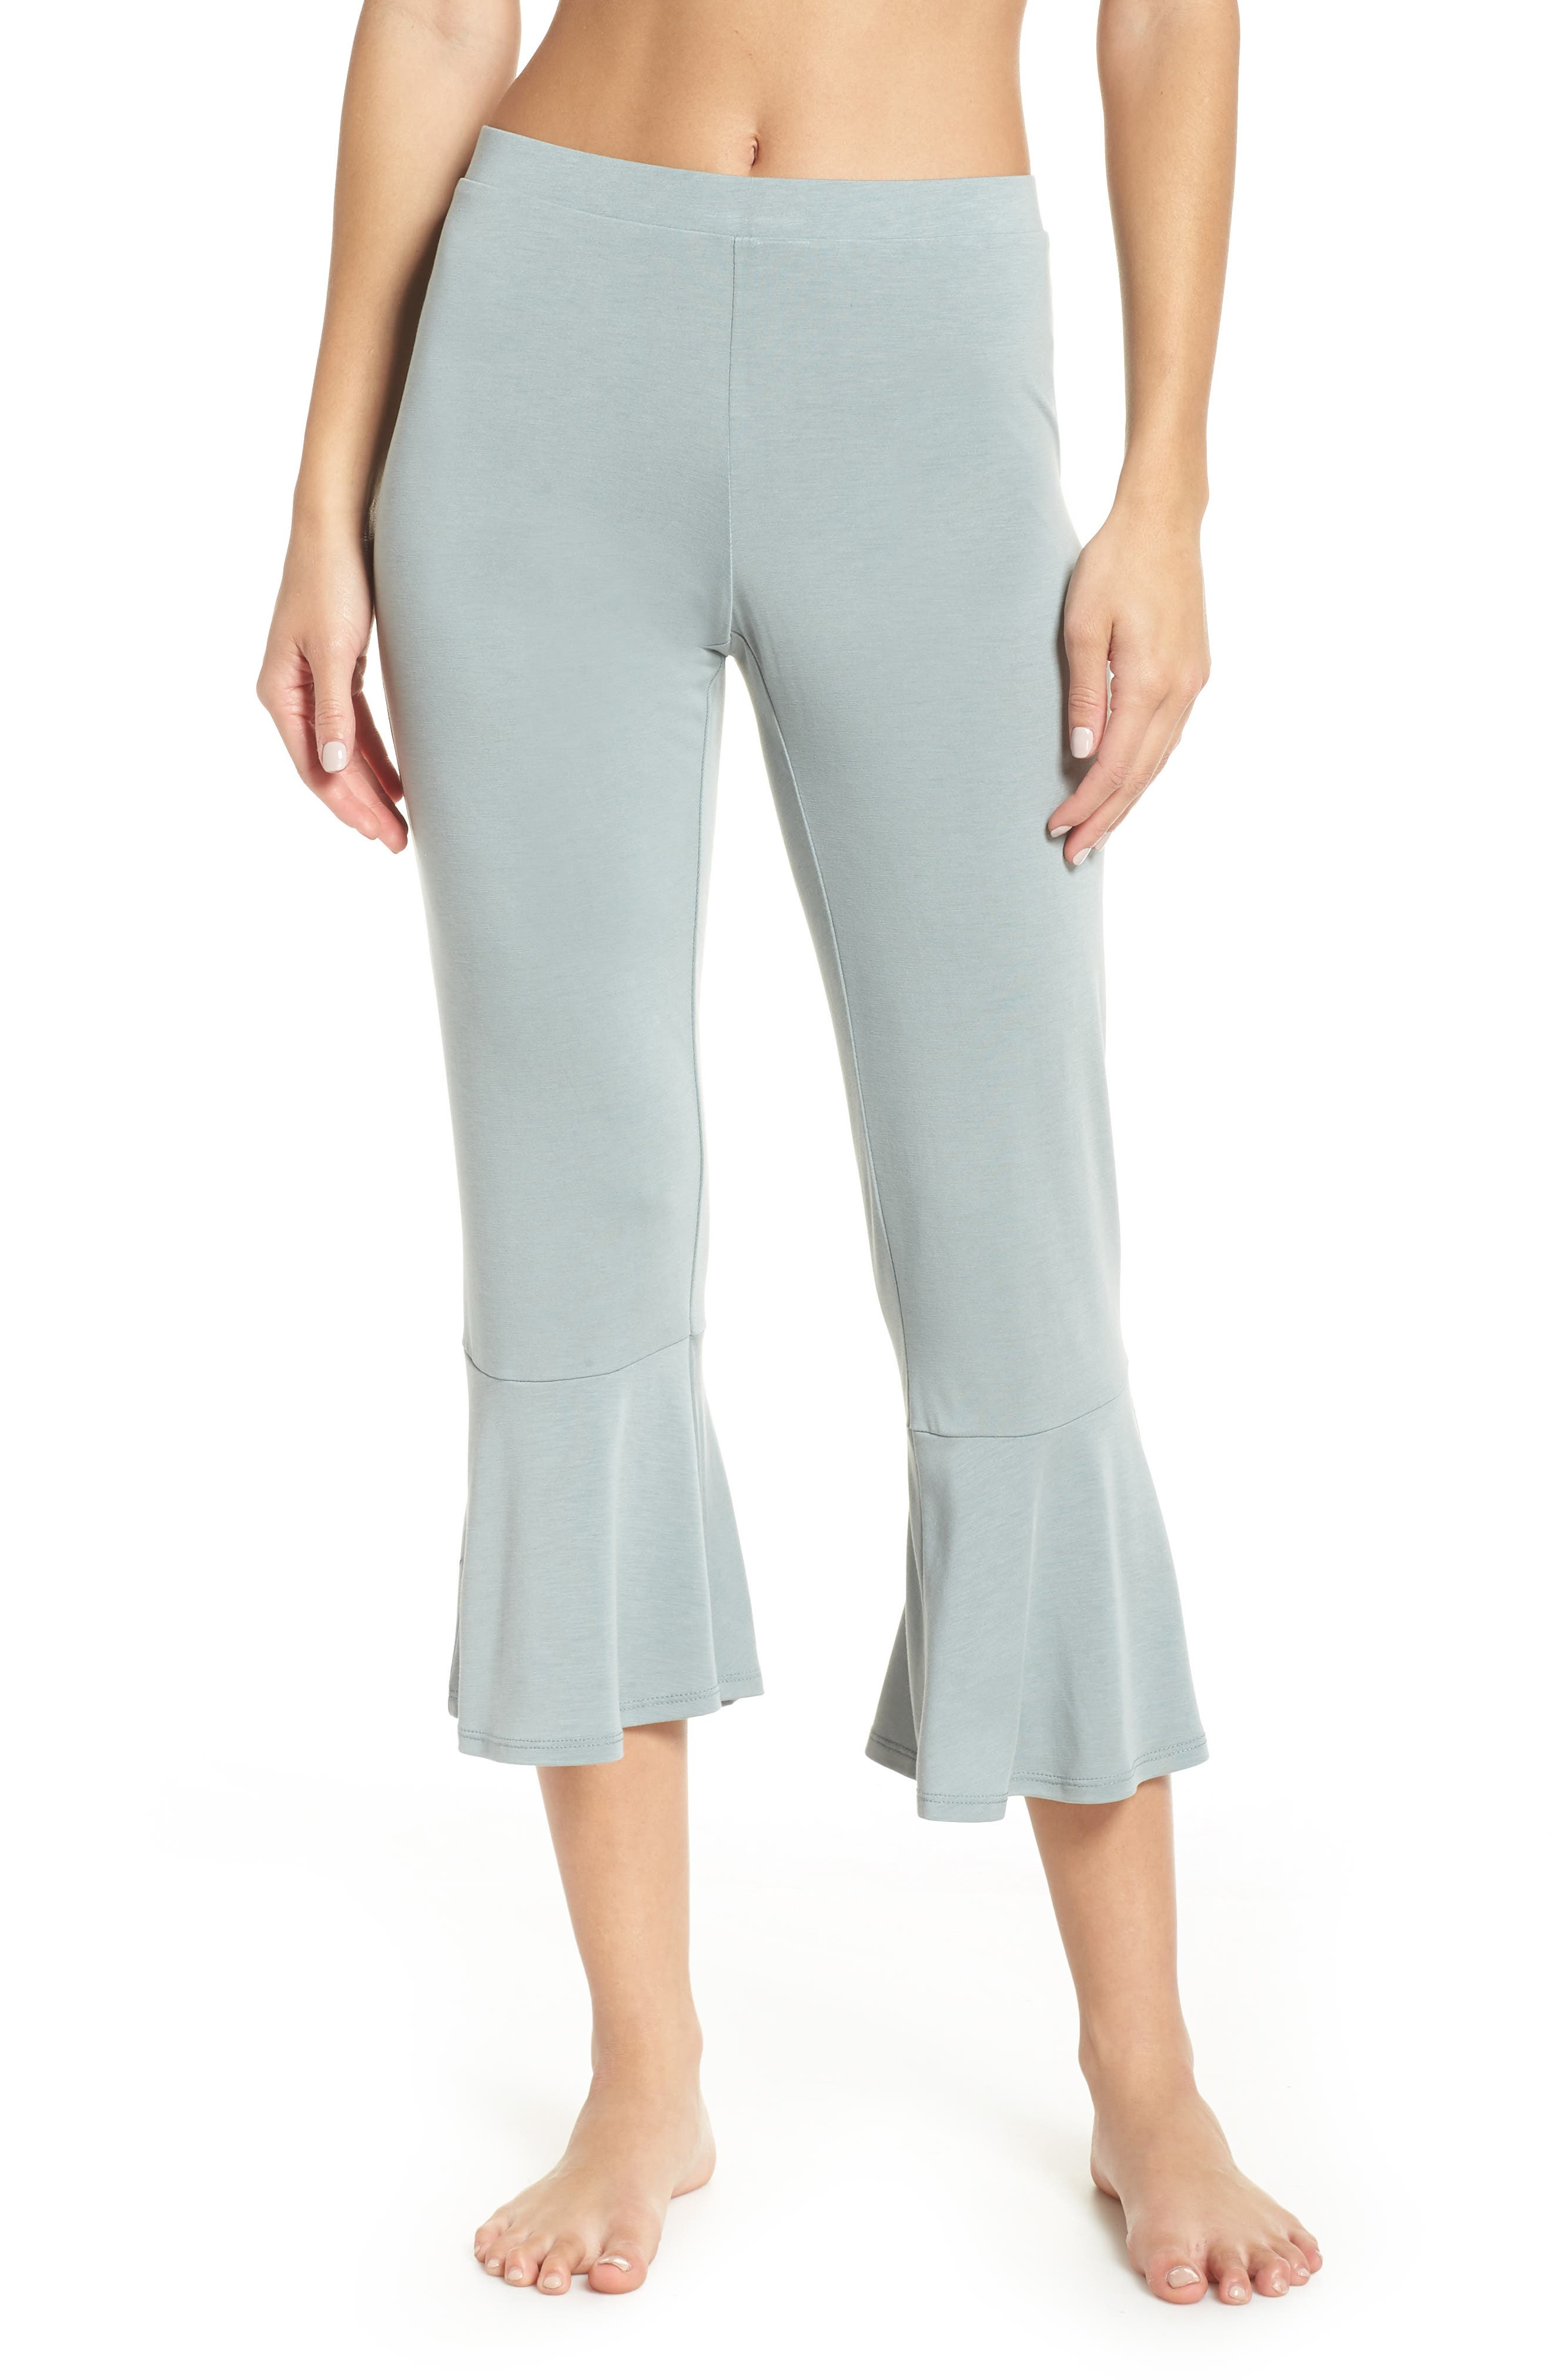 Aden Ruffle Hem Lounge Pants, Main, color, MINERAL SAGE